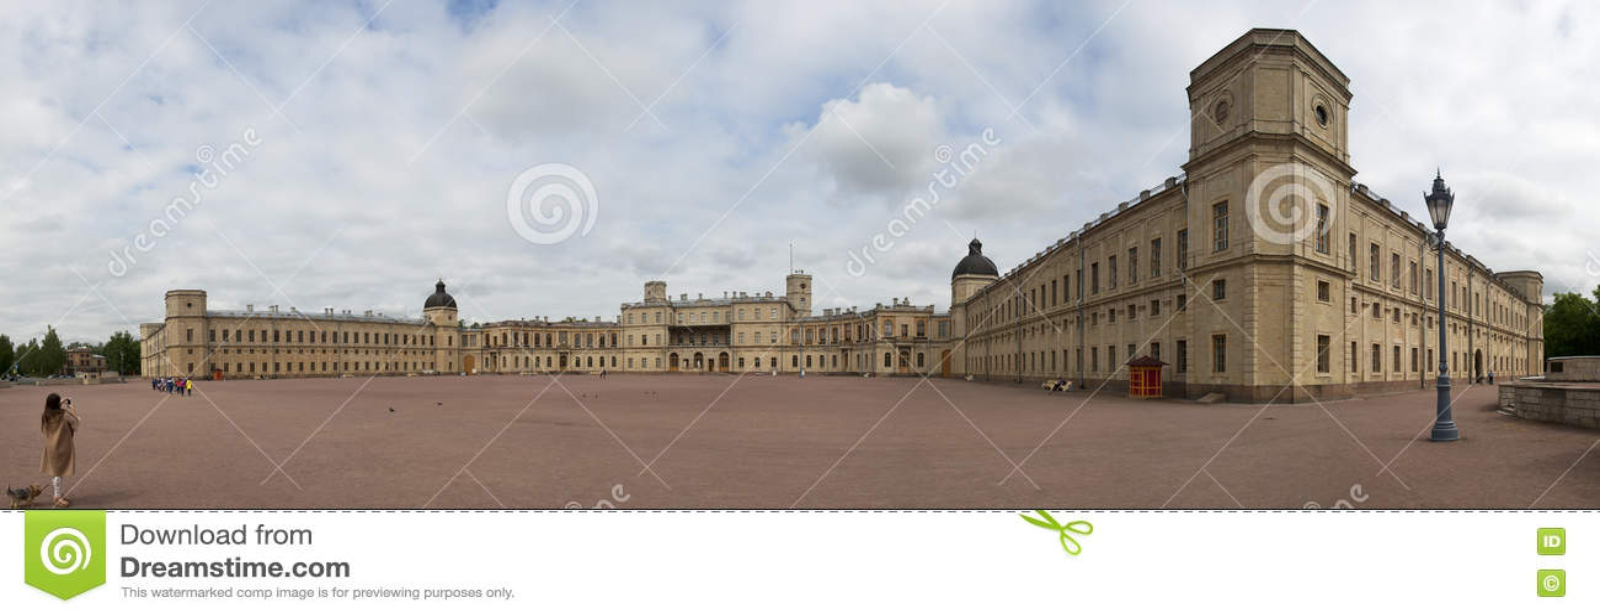 En panorama av den stora Gatchina slotten